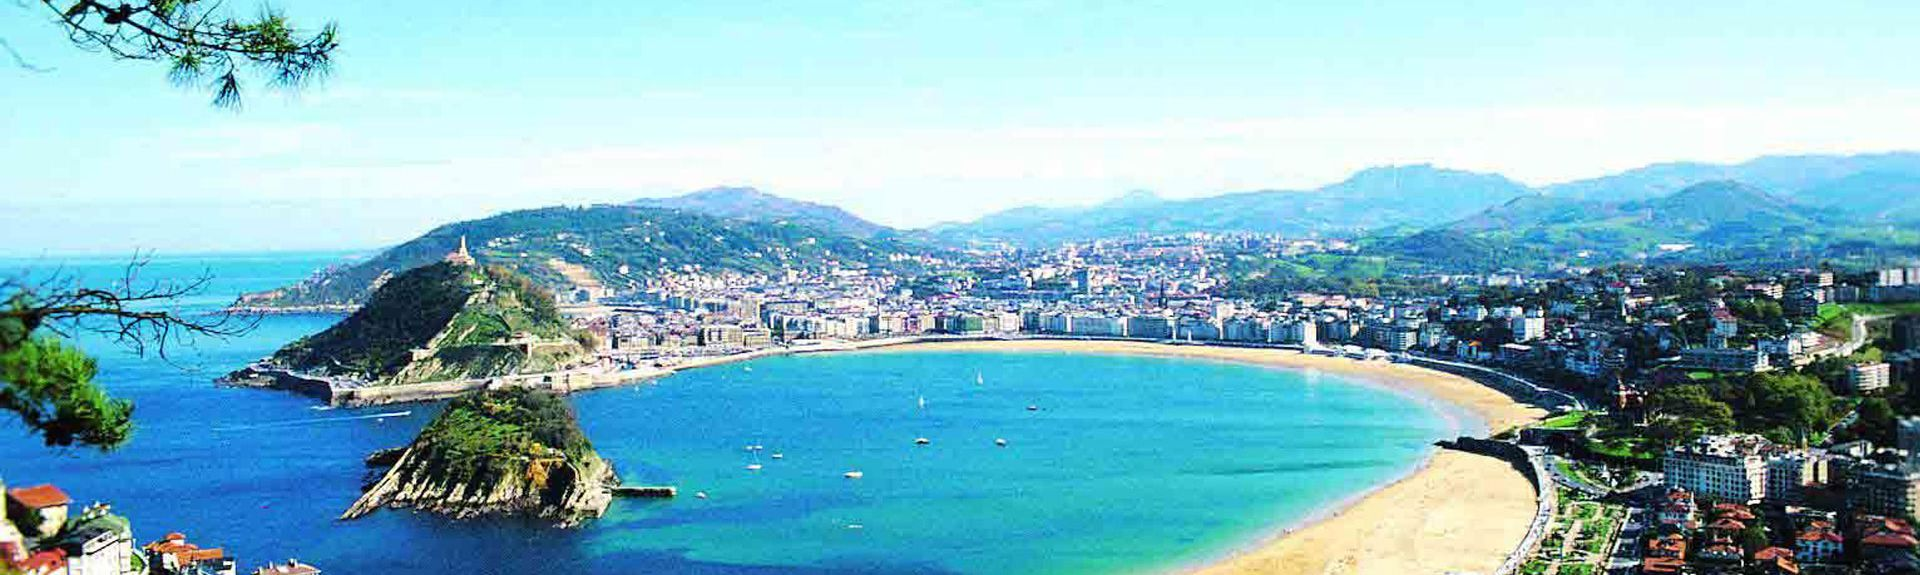 Pasaia, País Basco, Espanha